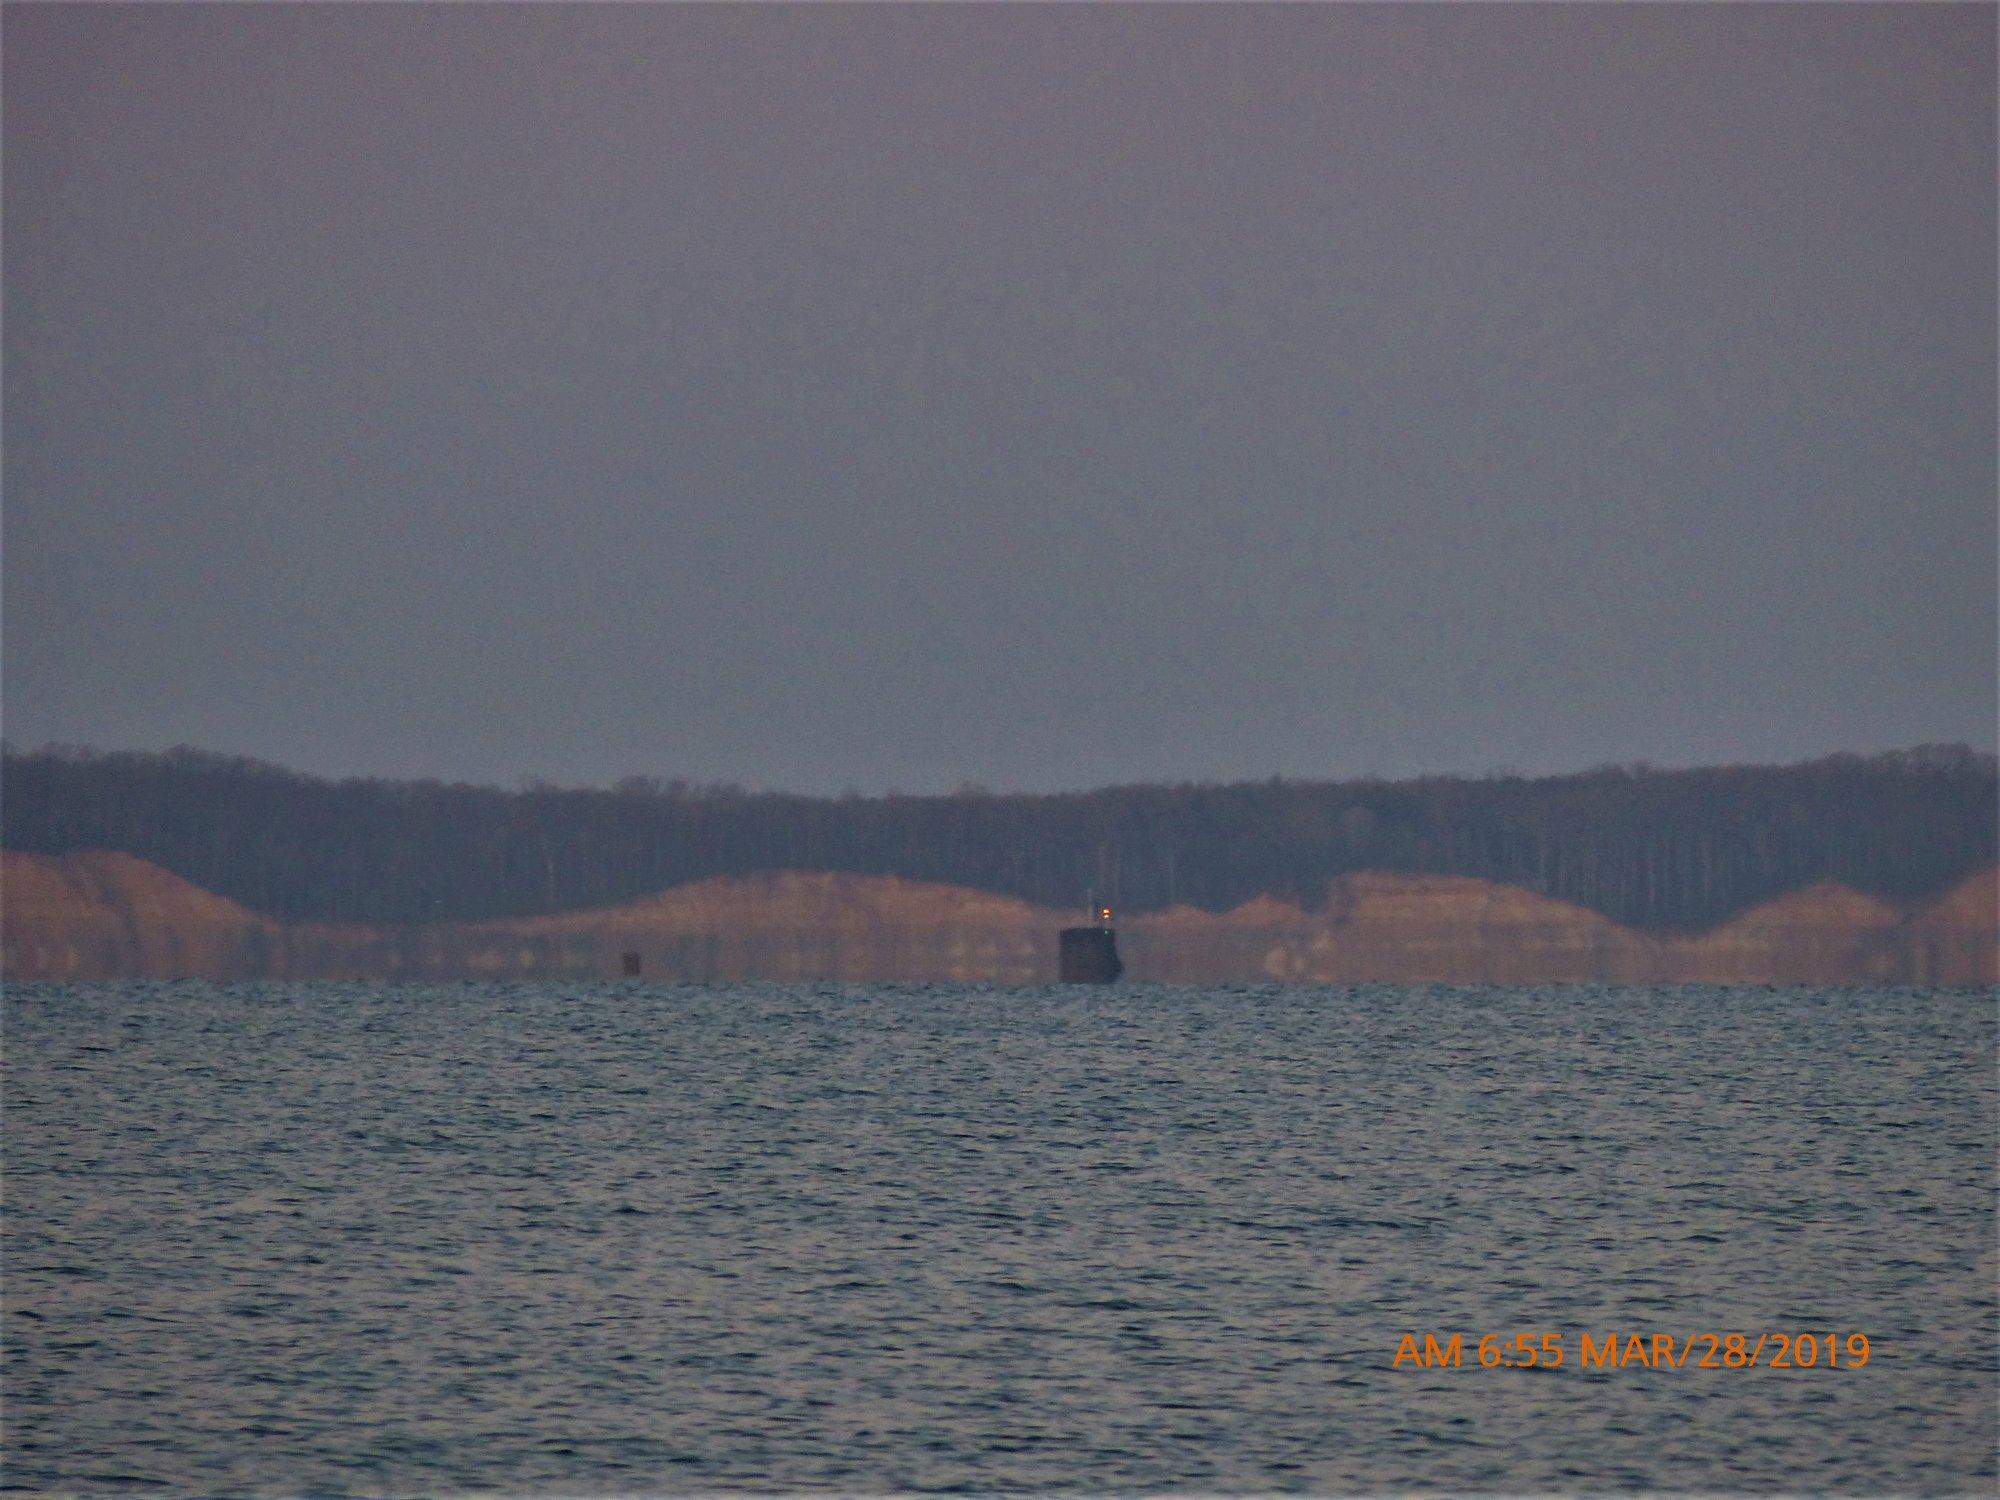 USS  North Dakota  is visible passing Calvert Cliffs at dawn Thursday. Photo: Taylors Island Maryland/ Facebook